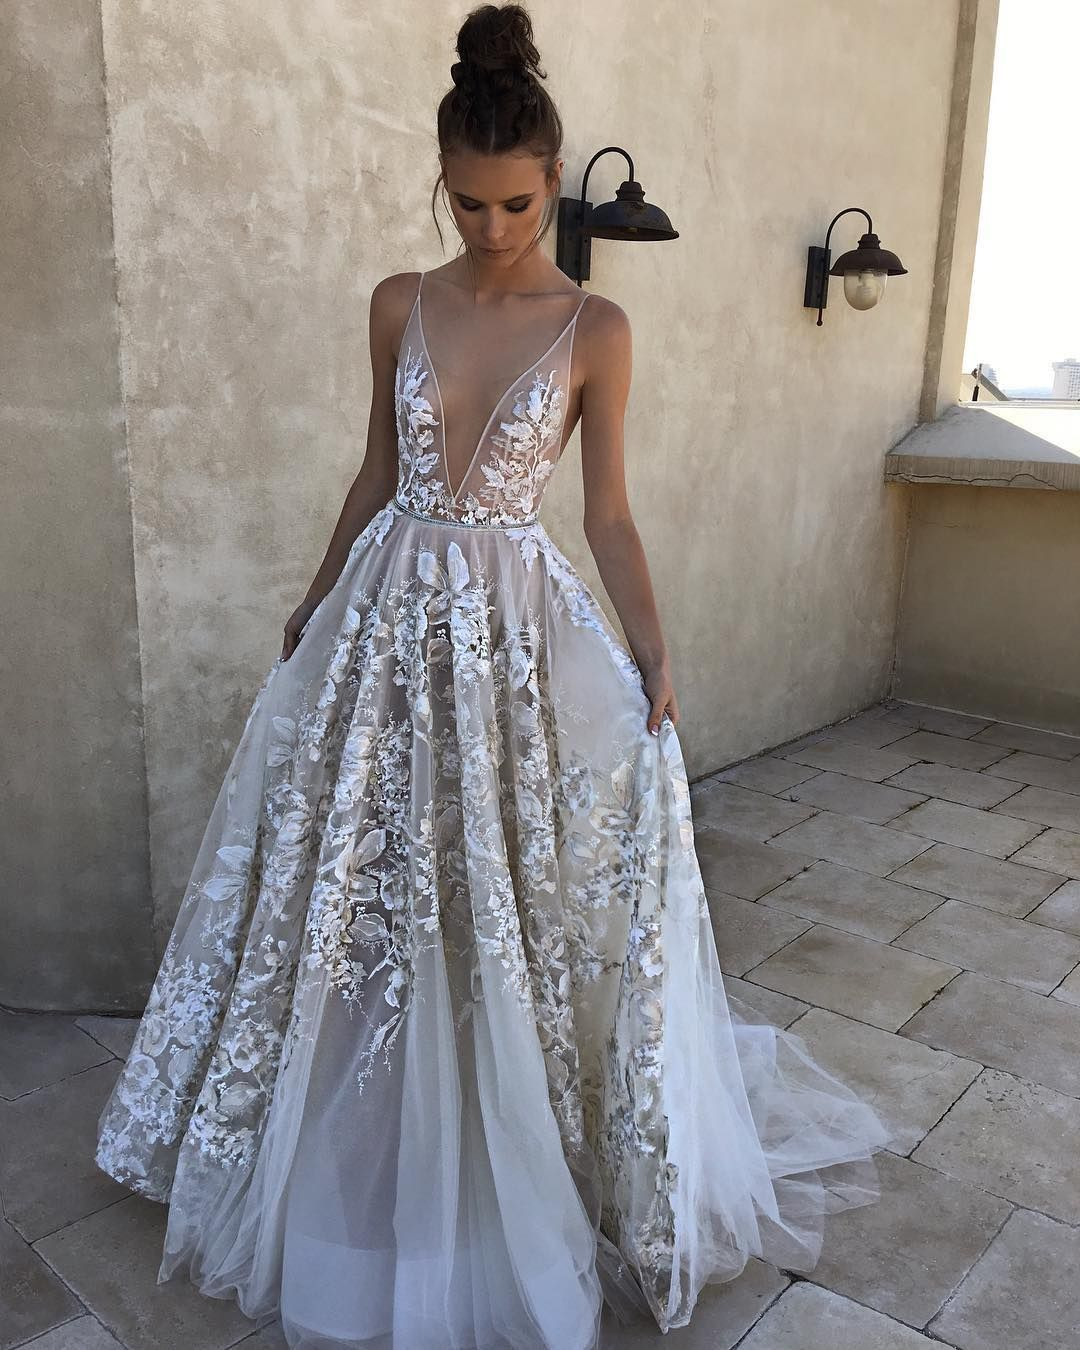 Pin by jordan pearson on my fairytale pinterest wedding wedding